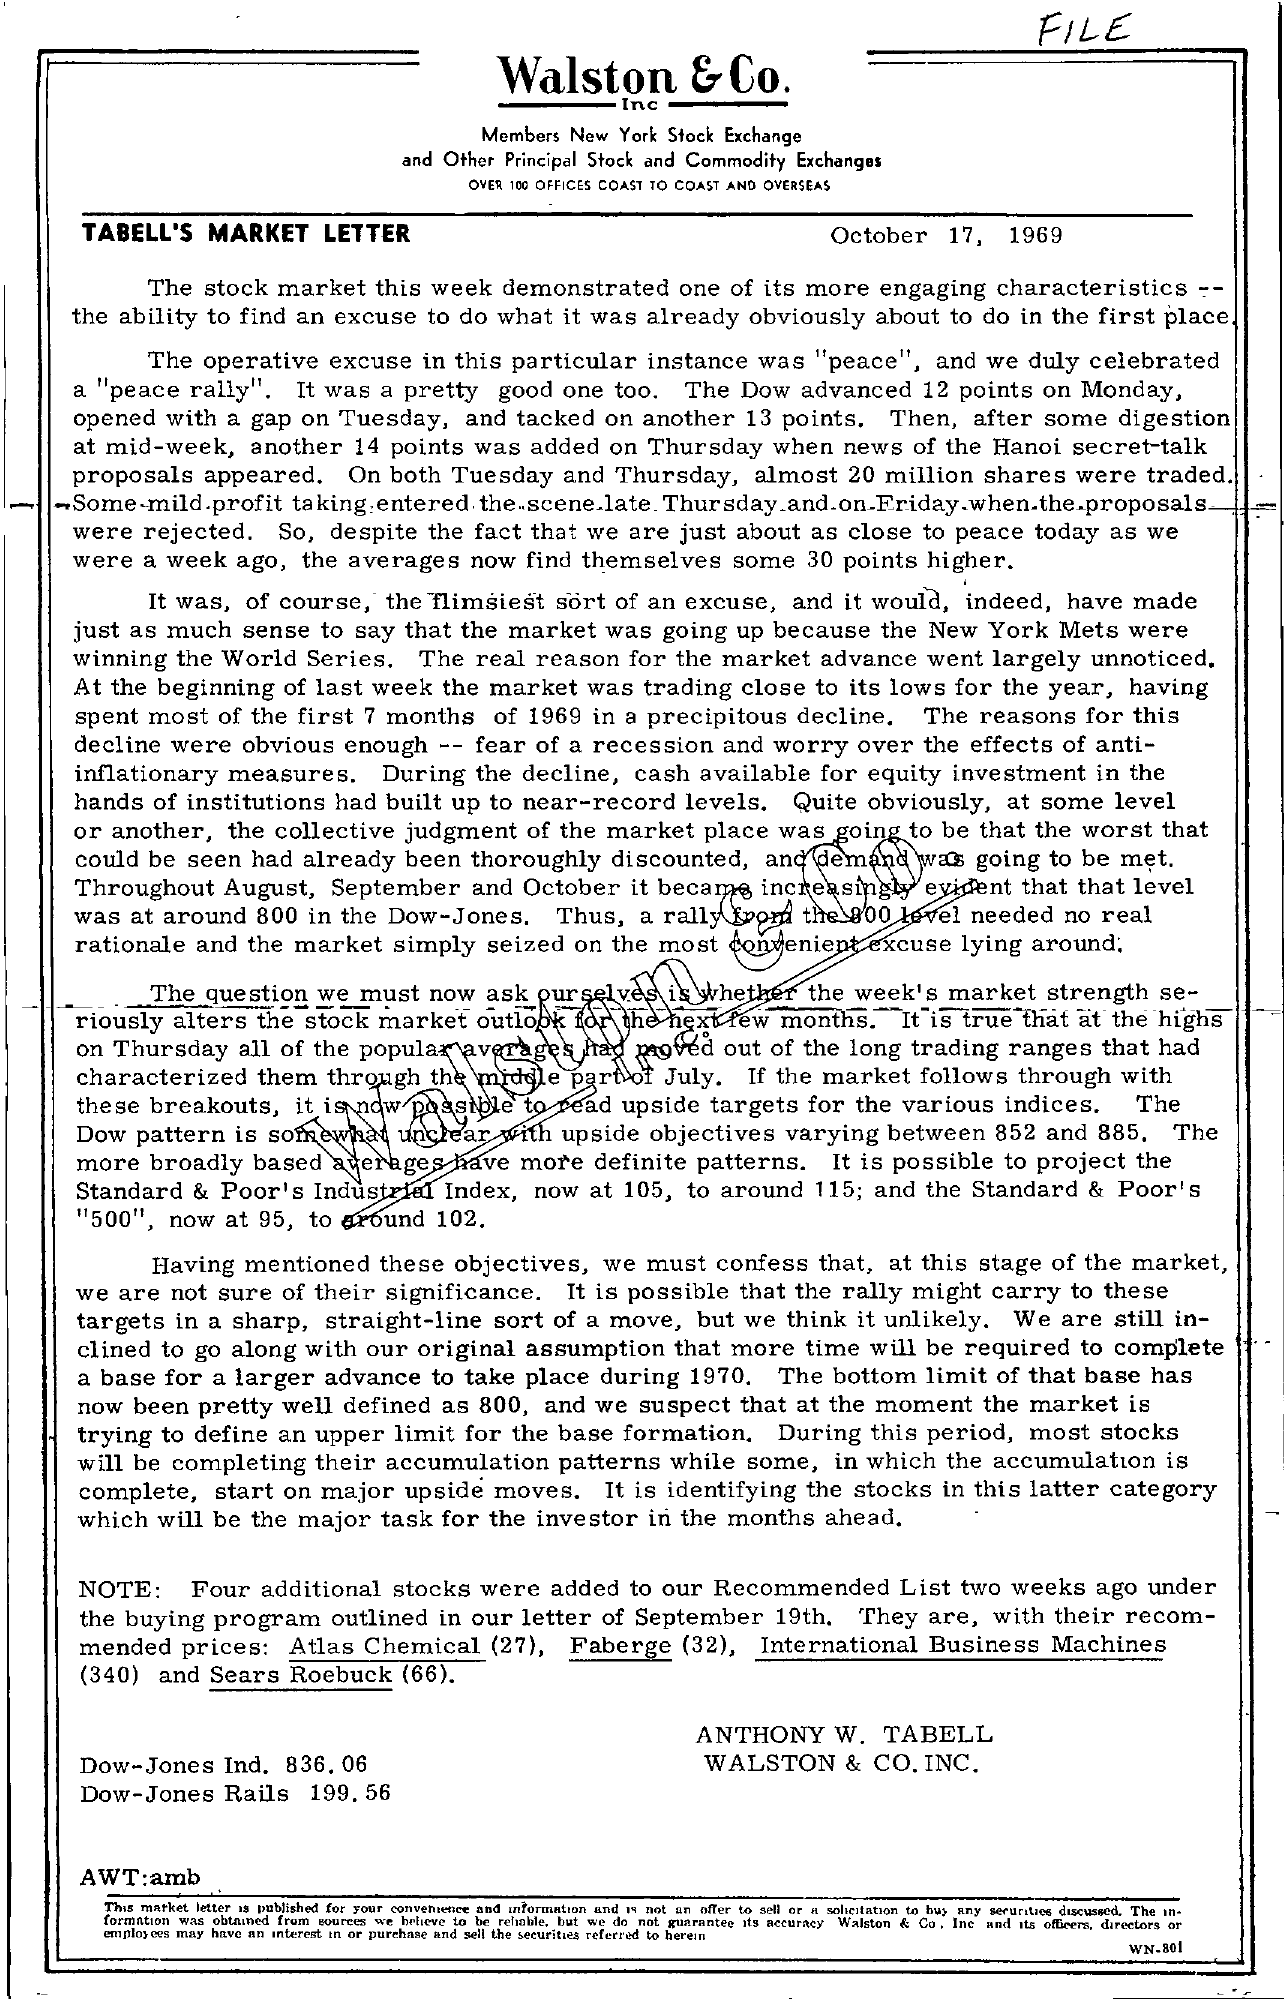 Tabell's Market Letter - October 17, 1969